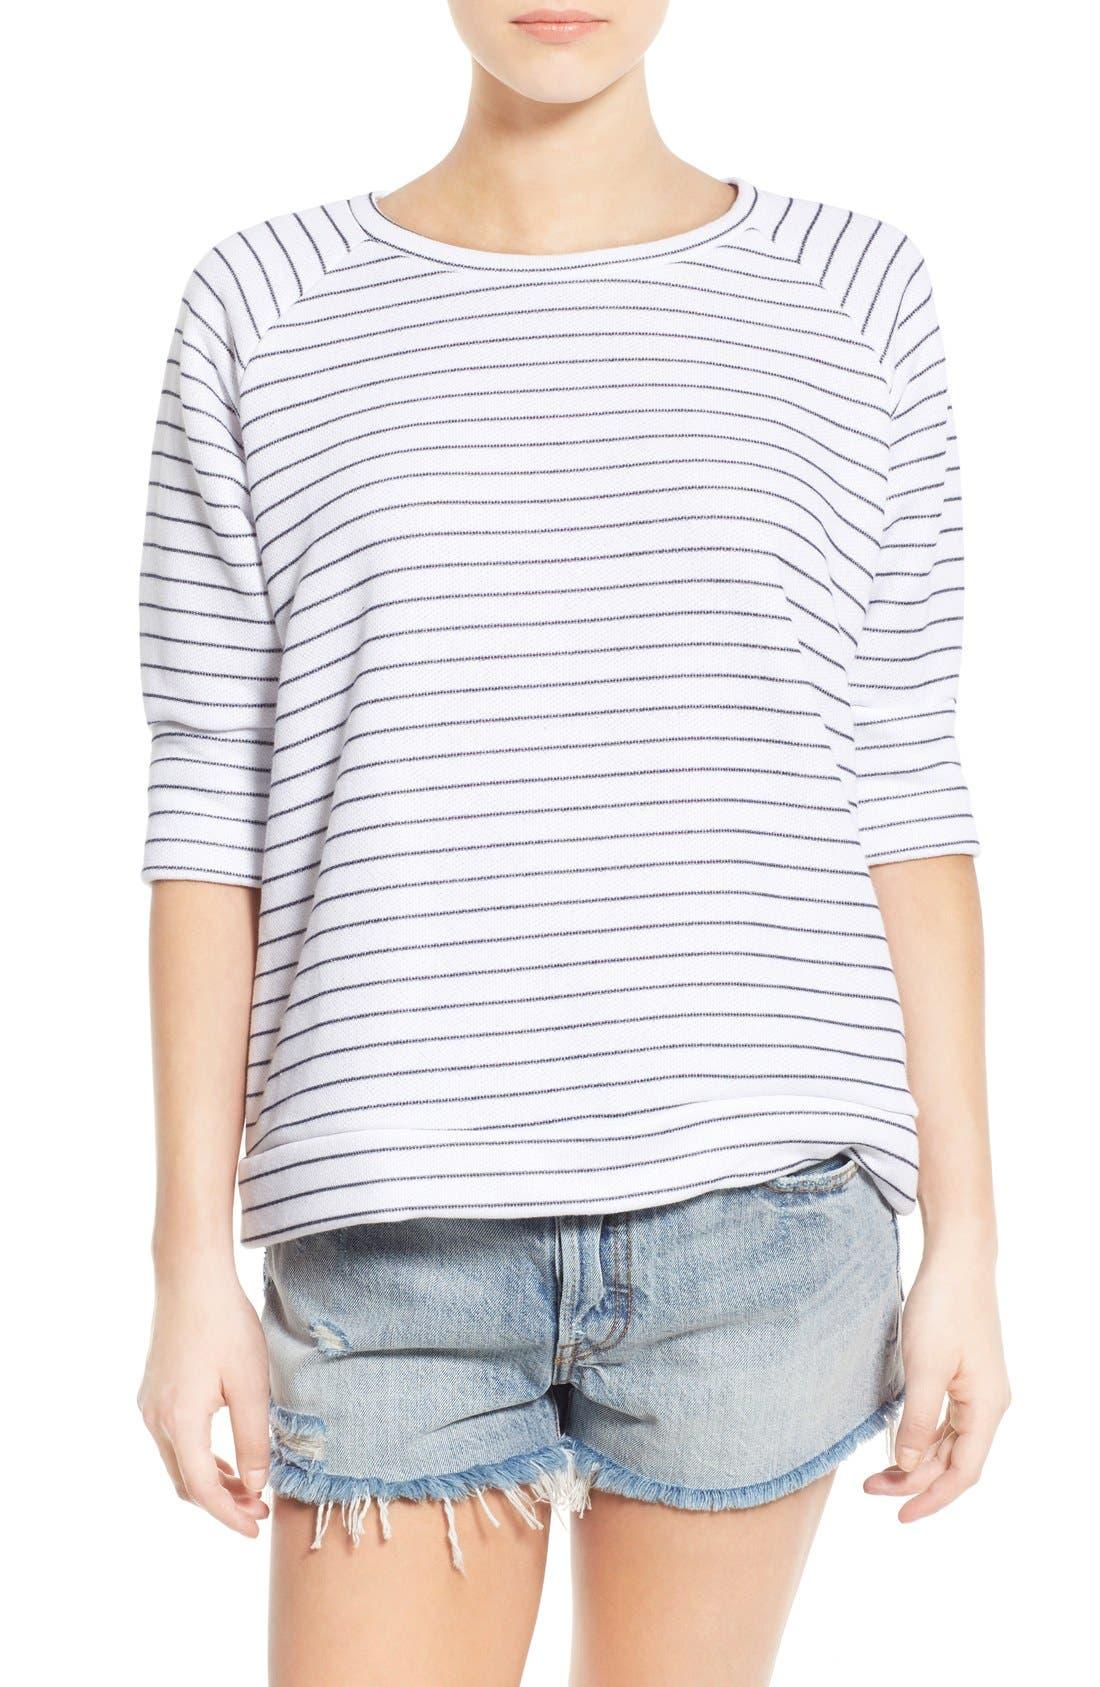 Alternate Image 1 Selected - LNA 'Hacienda' Sweatshirt